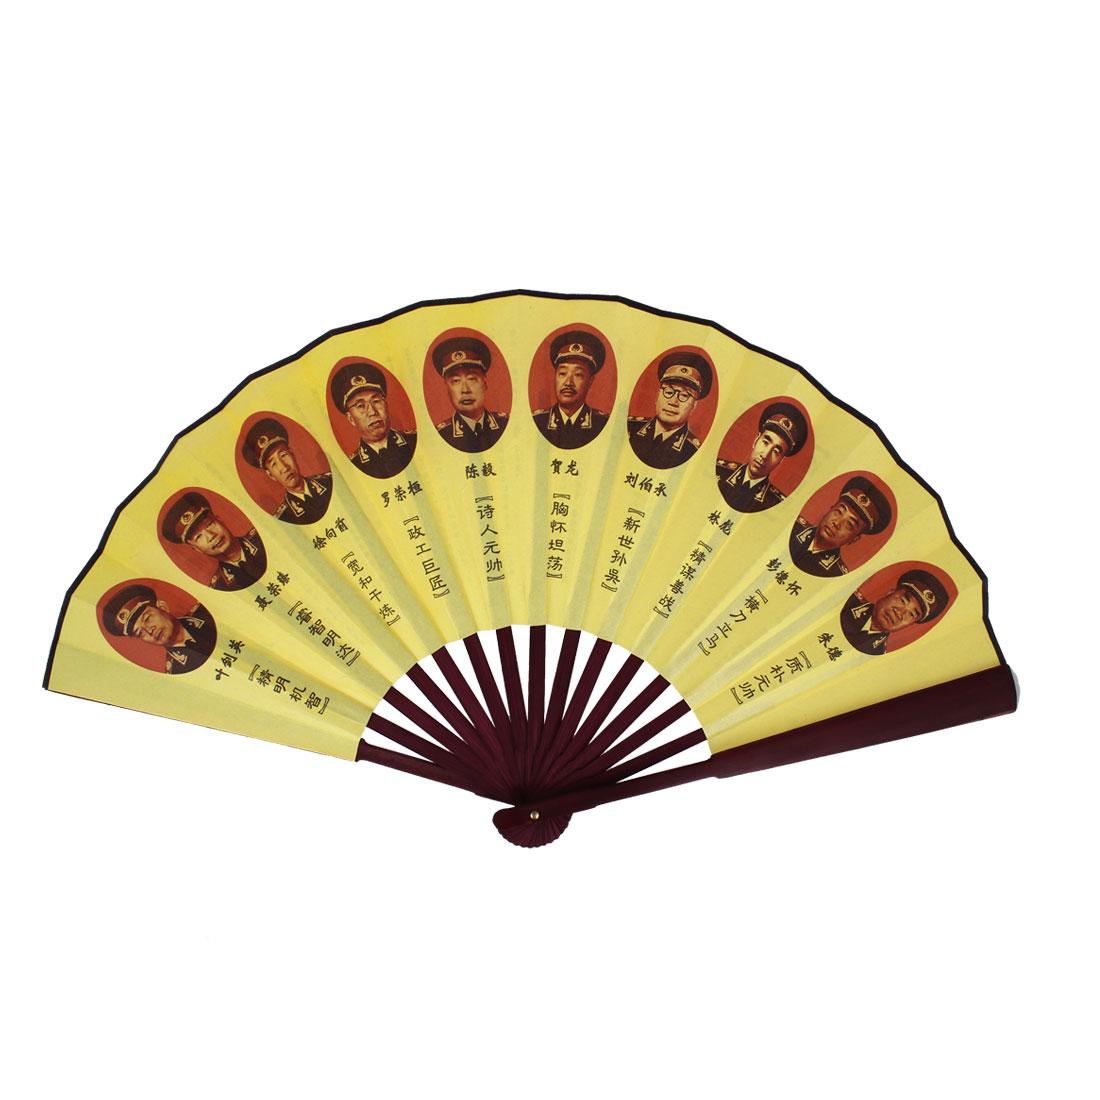 Bamboo Frame Ten Marshals Printed Handheld Folding Hand Fan Yellow